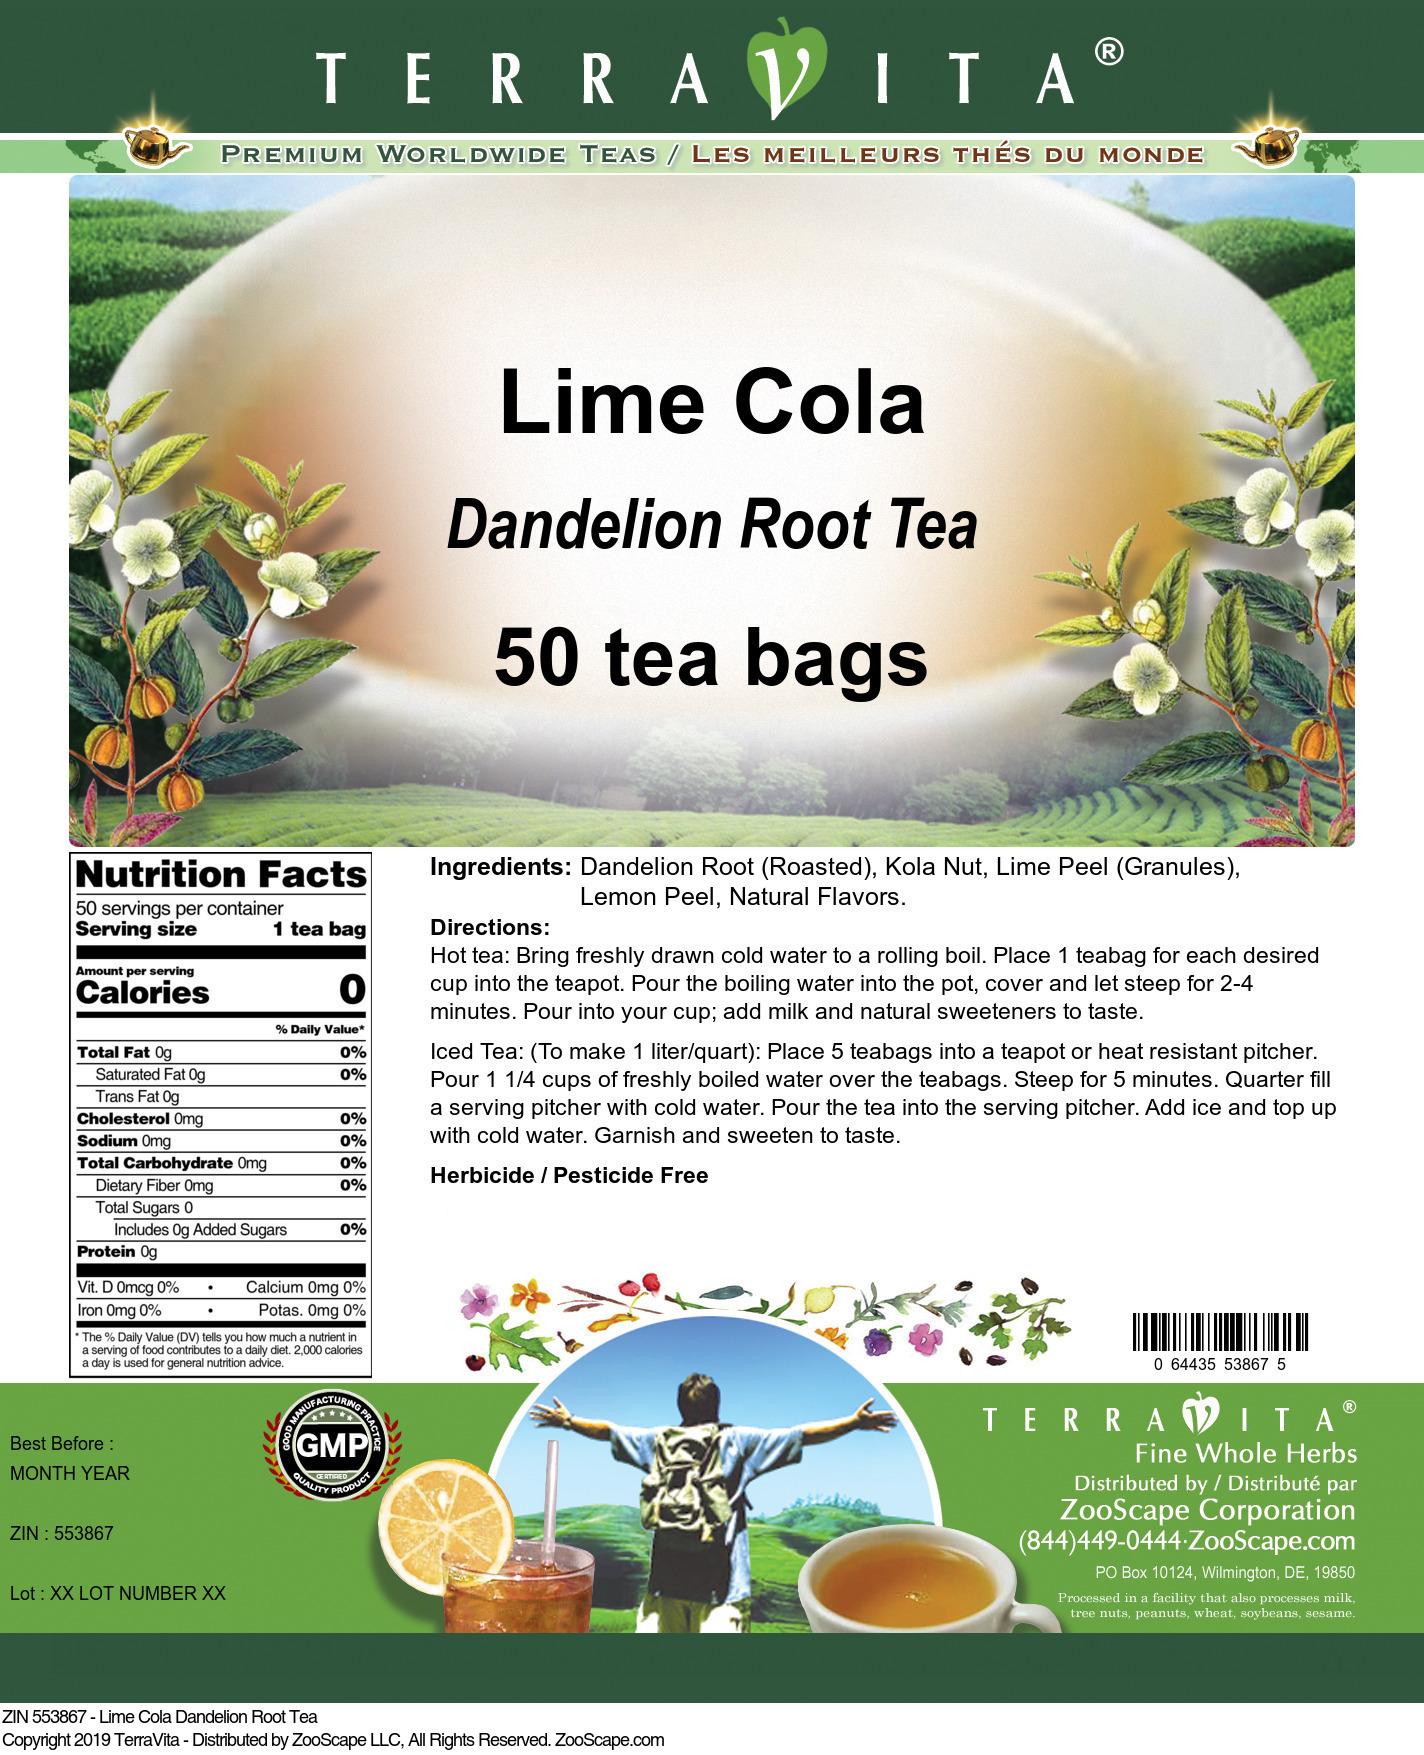 Lime Cola Dandelion Root Tea